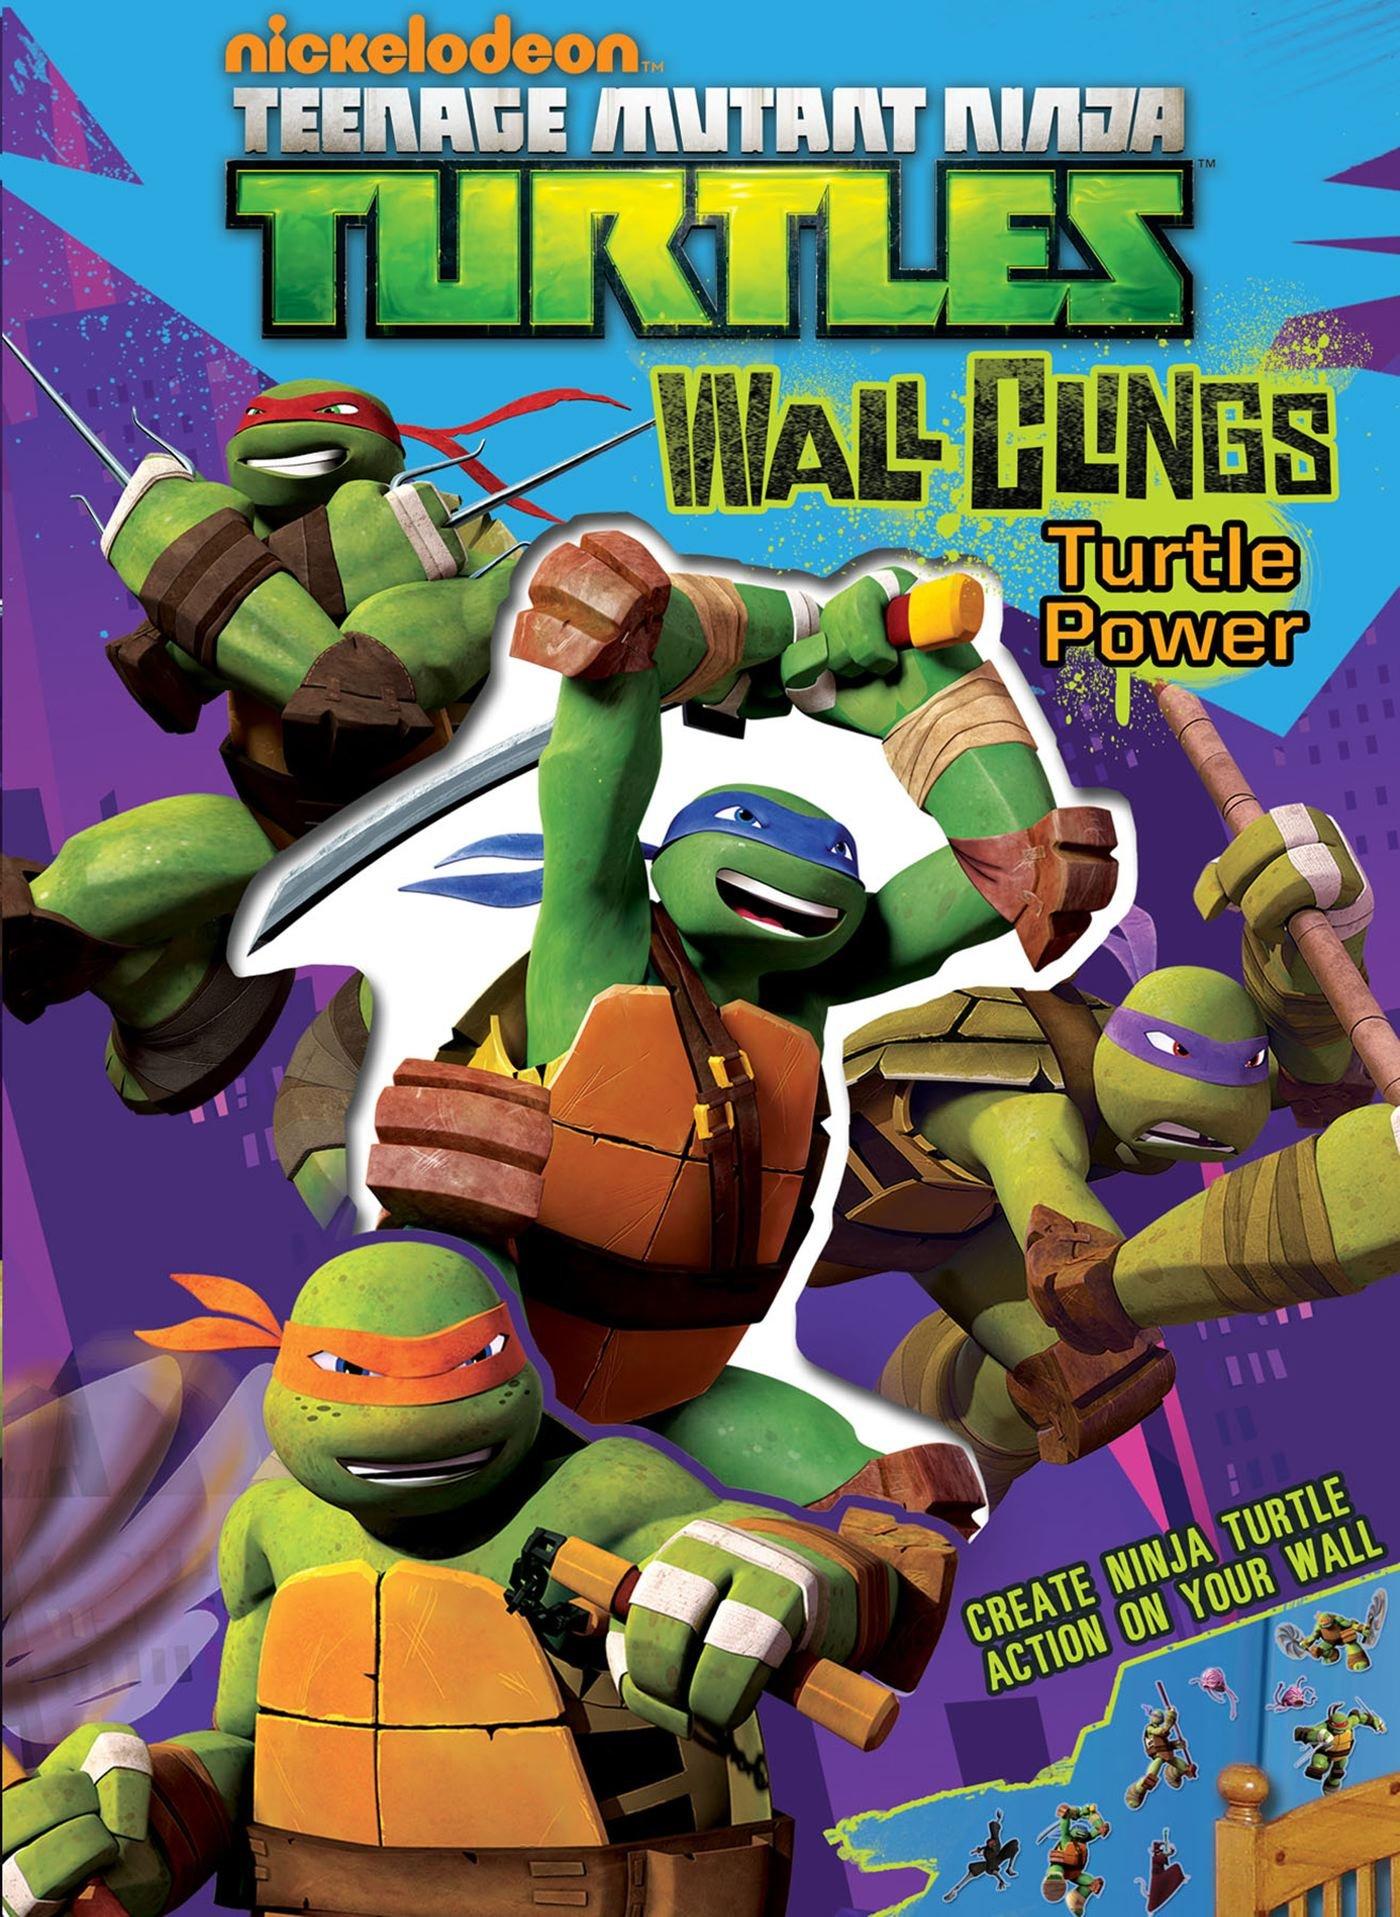 Teenage Mutant Ninja Turtles Wall Clings: Turtle Power ...